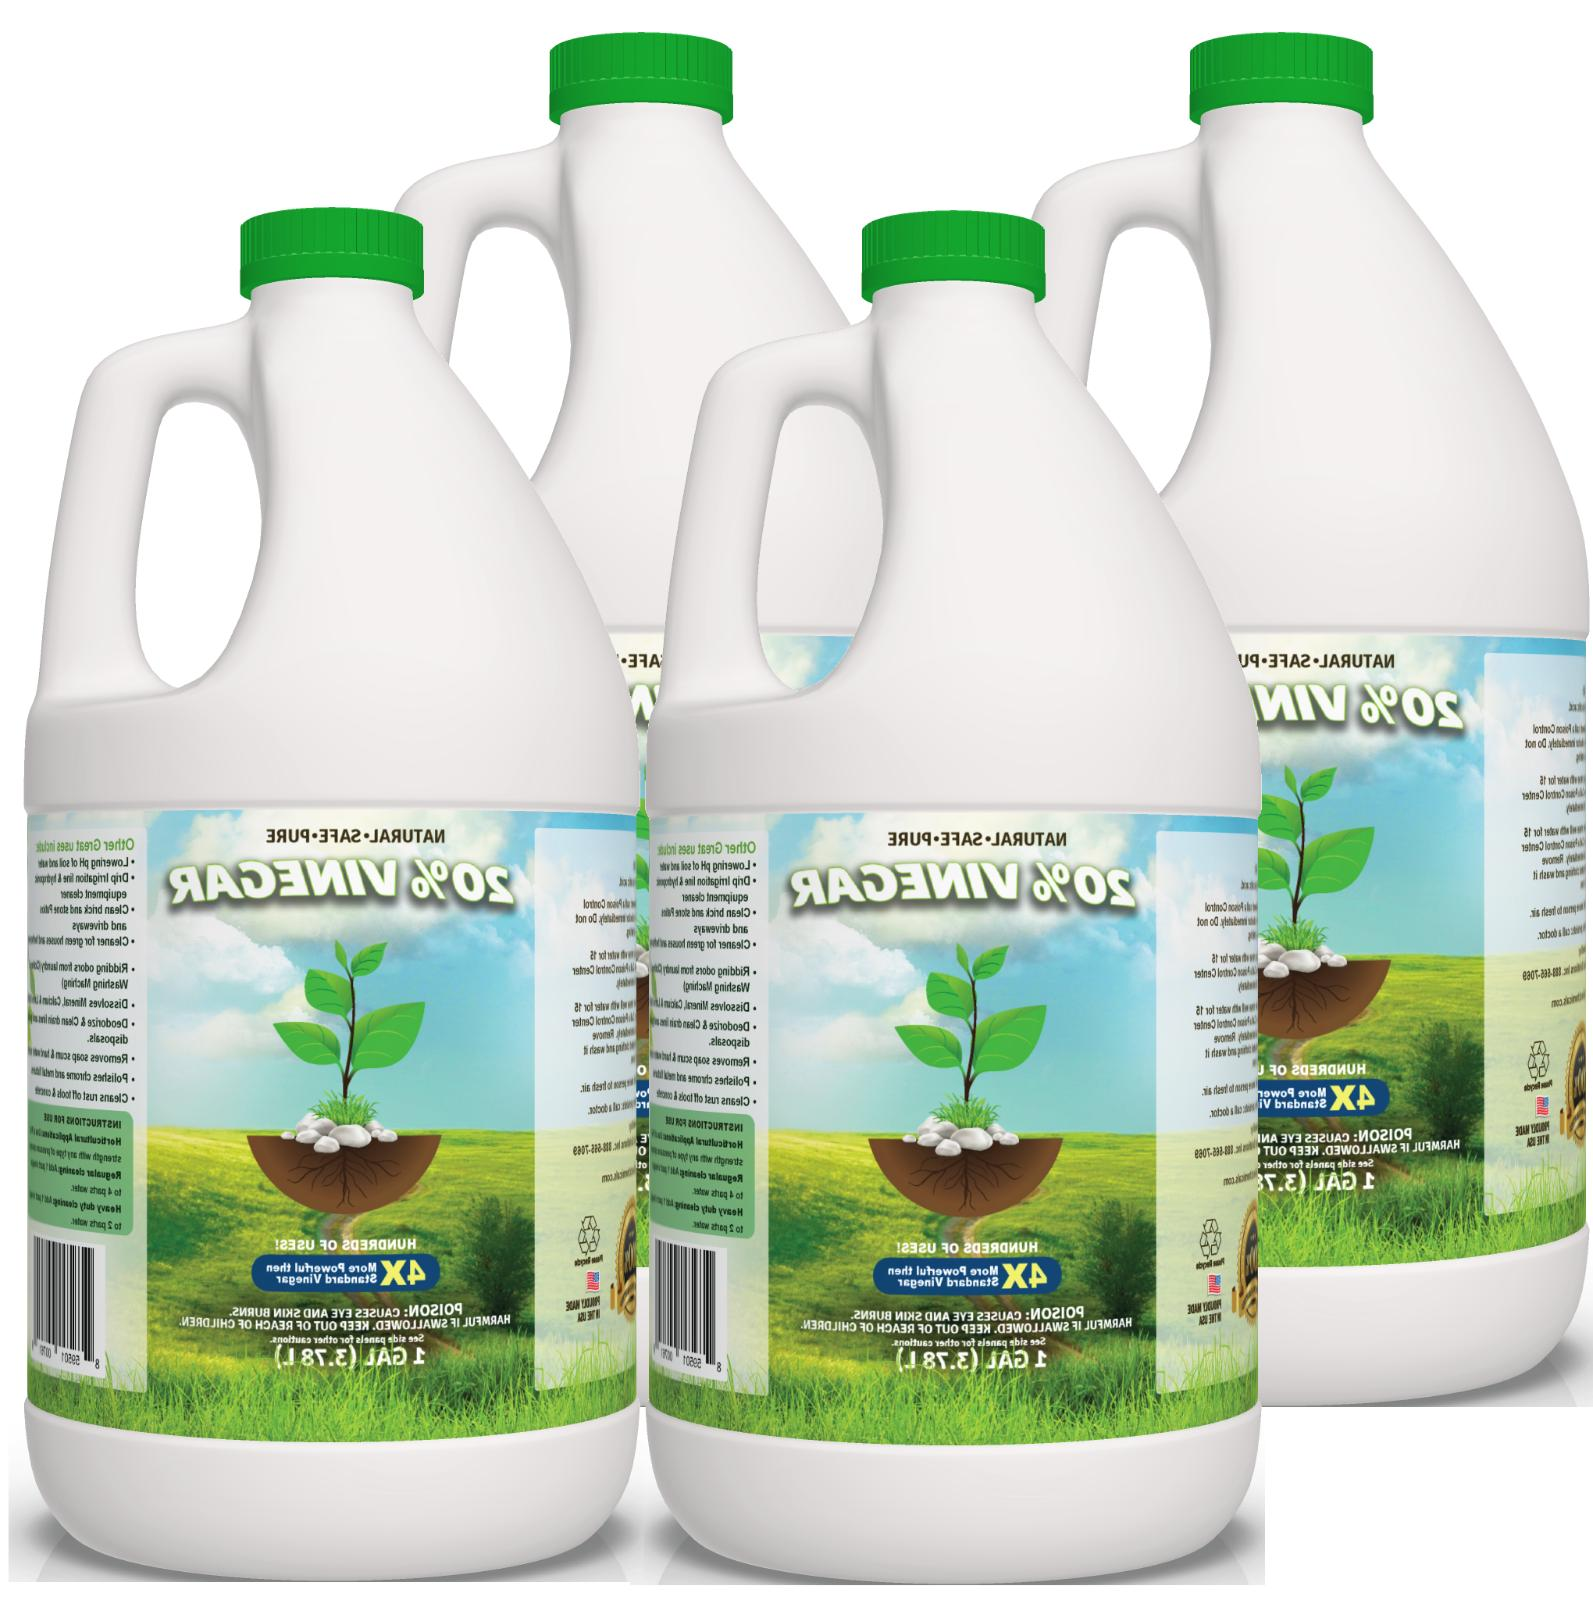 Pure VINEGAR Home & Natural, Distilled Vinegar